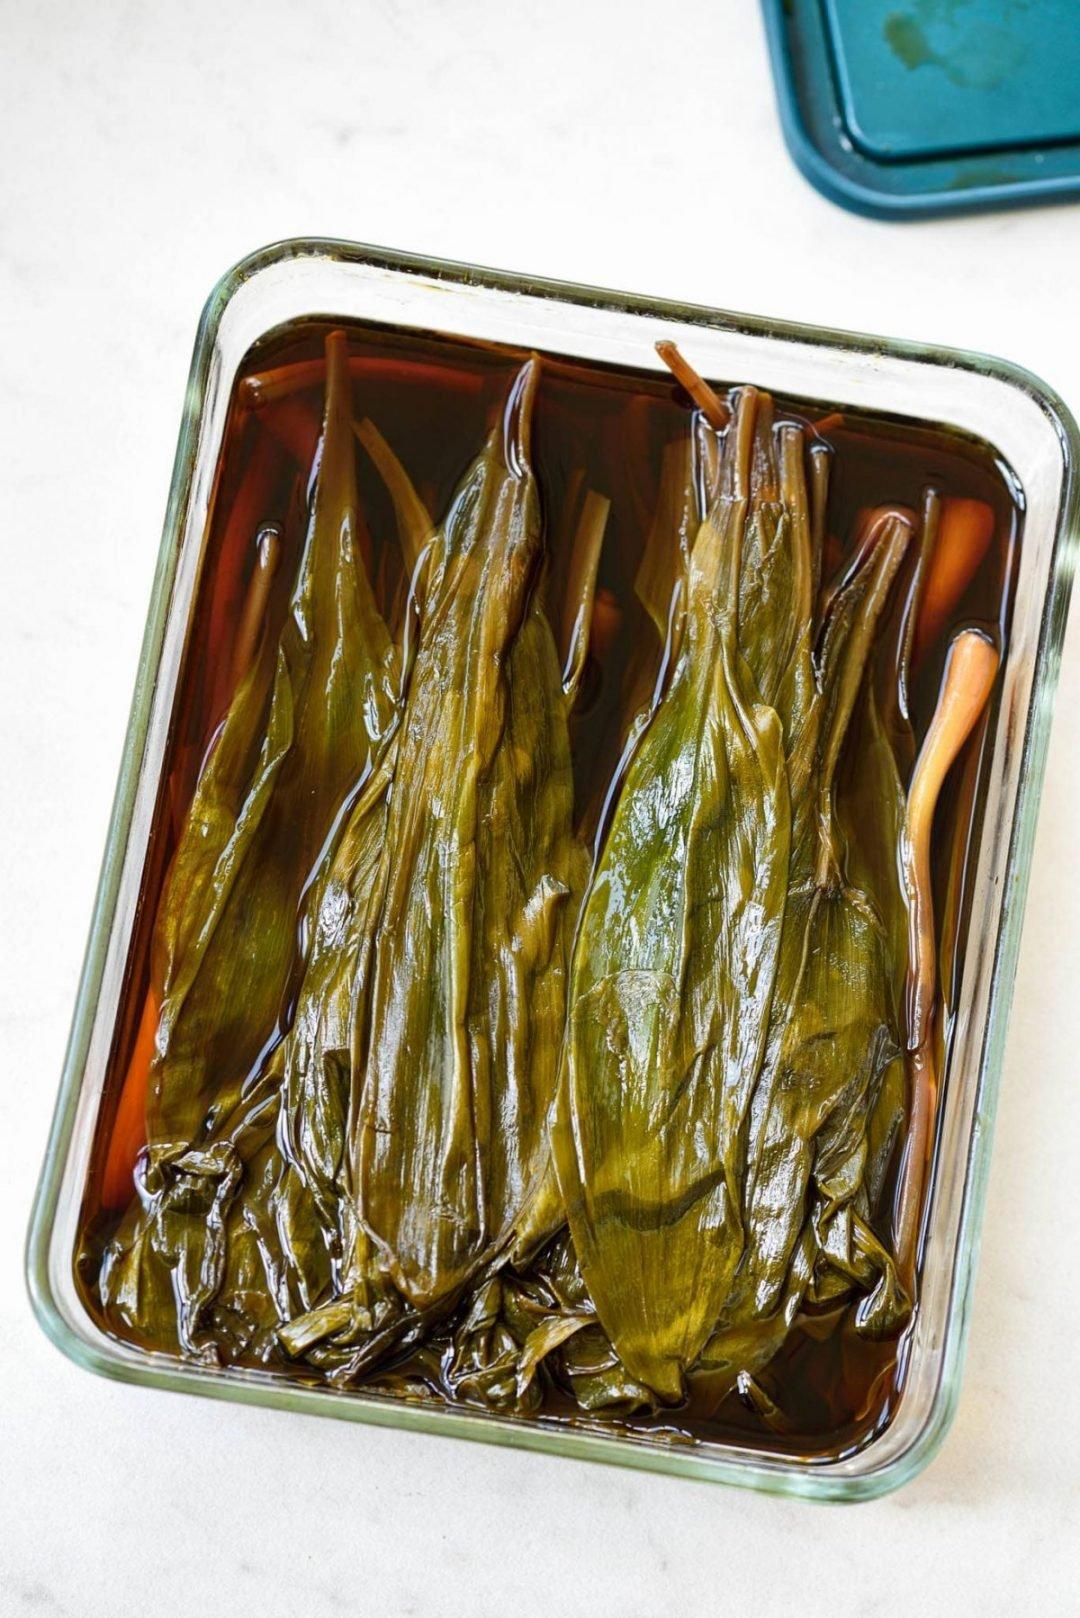 DSC2256 e1618709498499 - Jangajji (Vegetable Pickles)